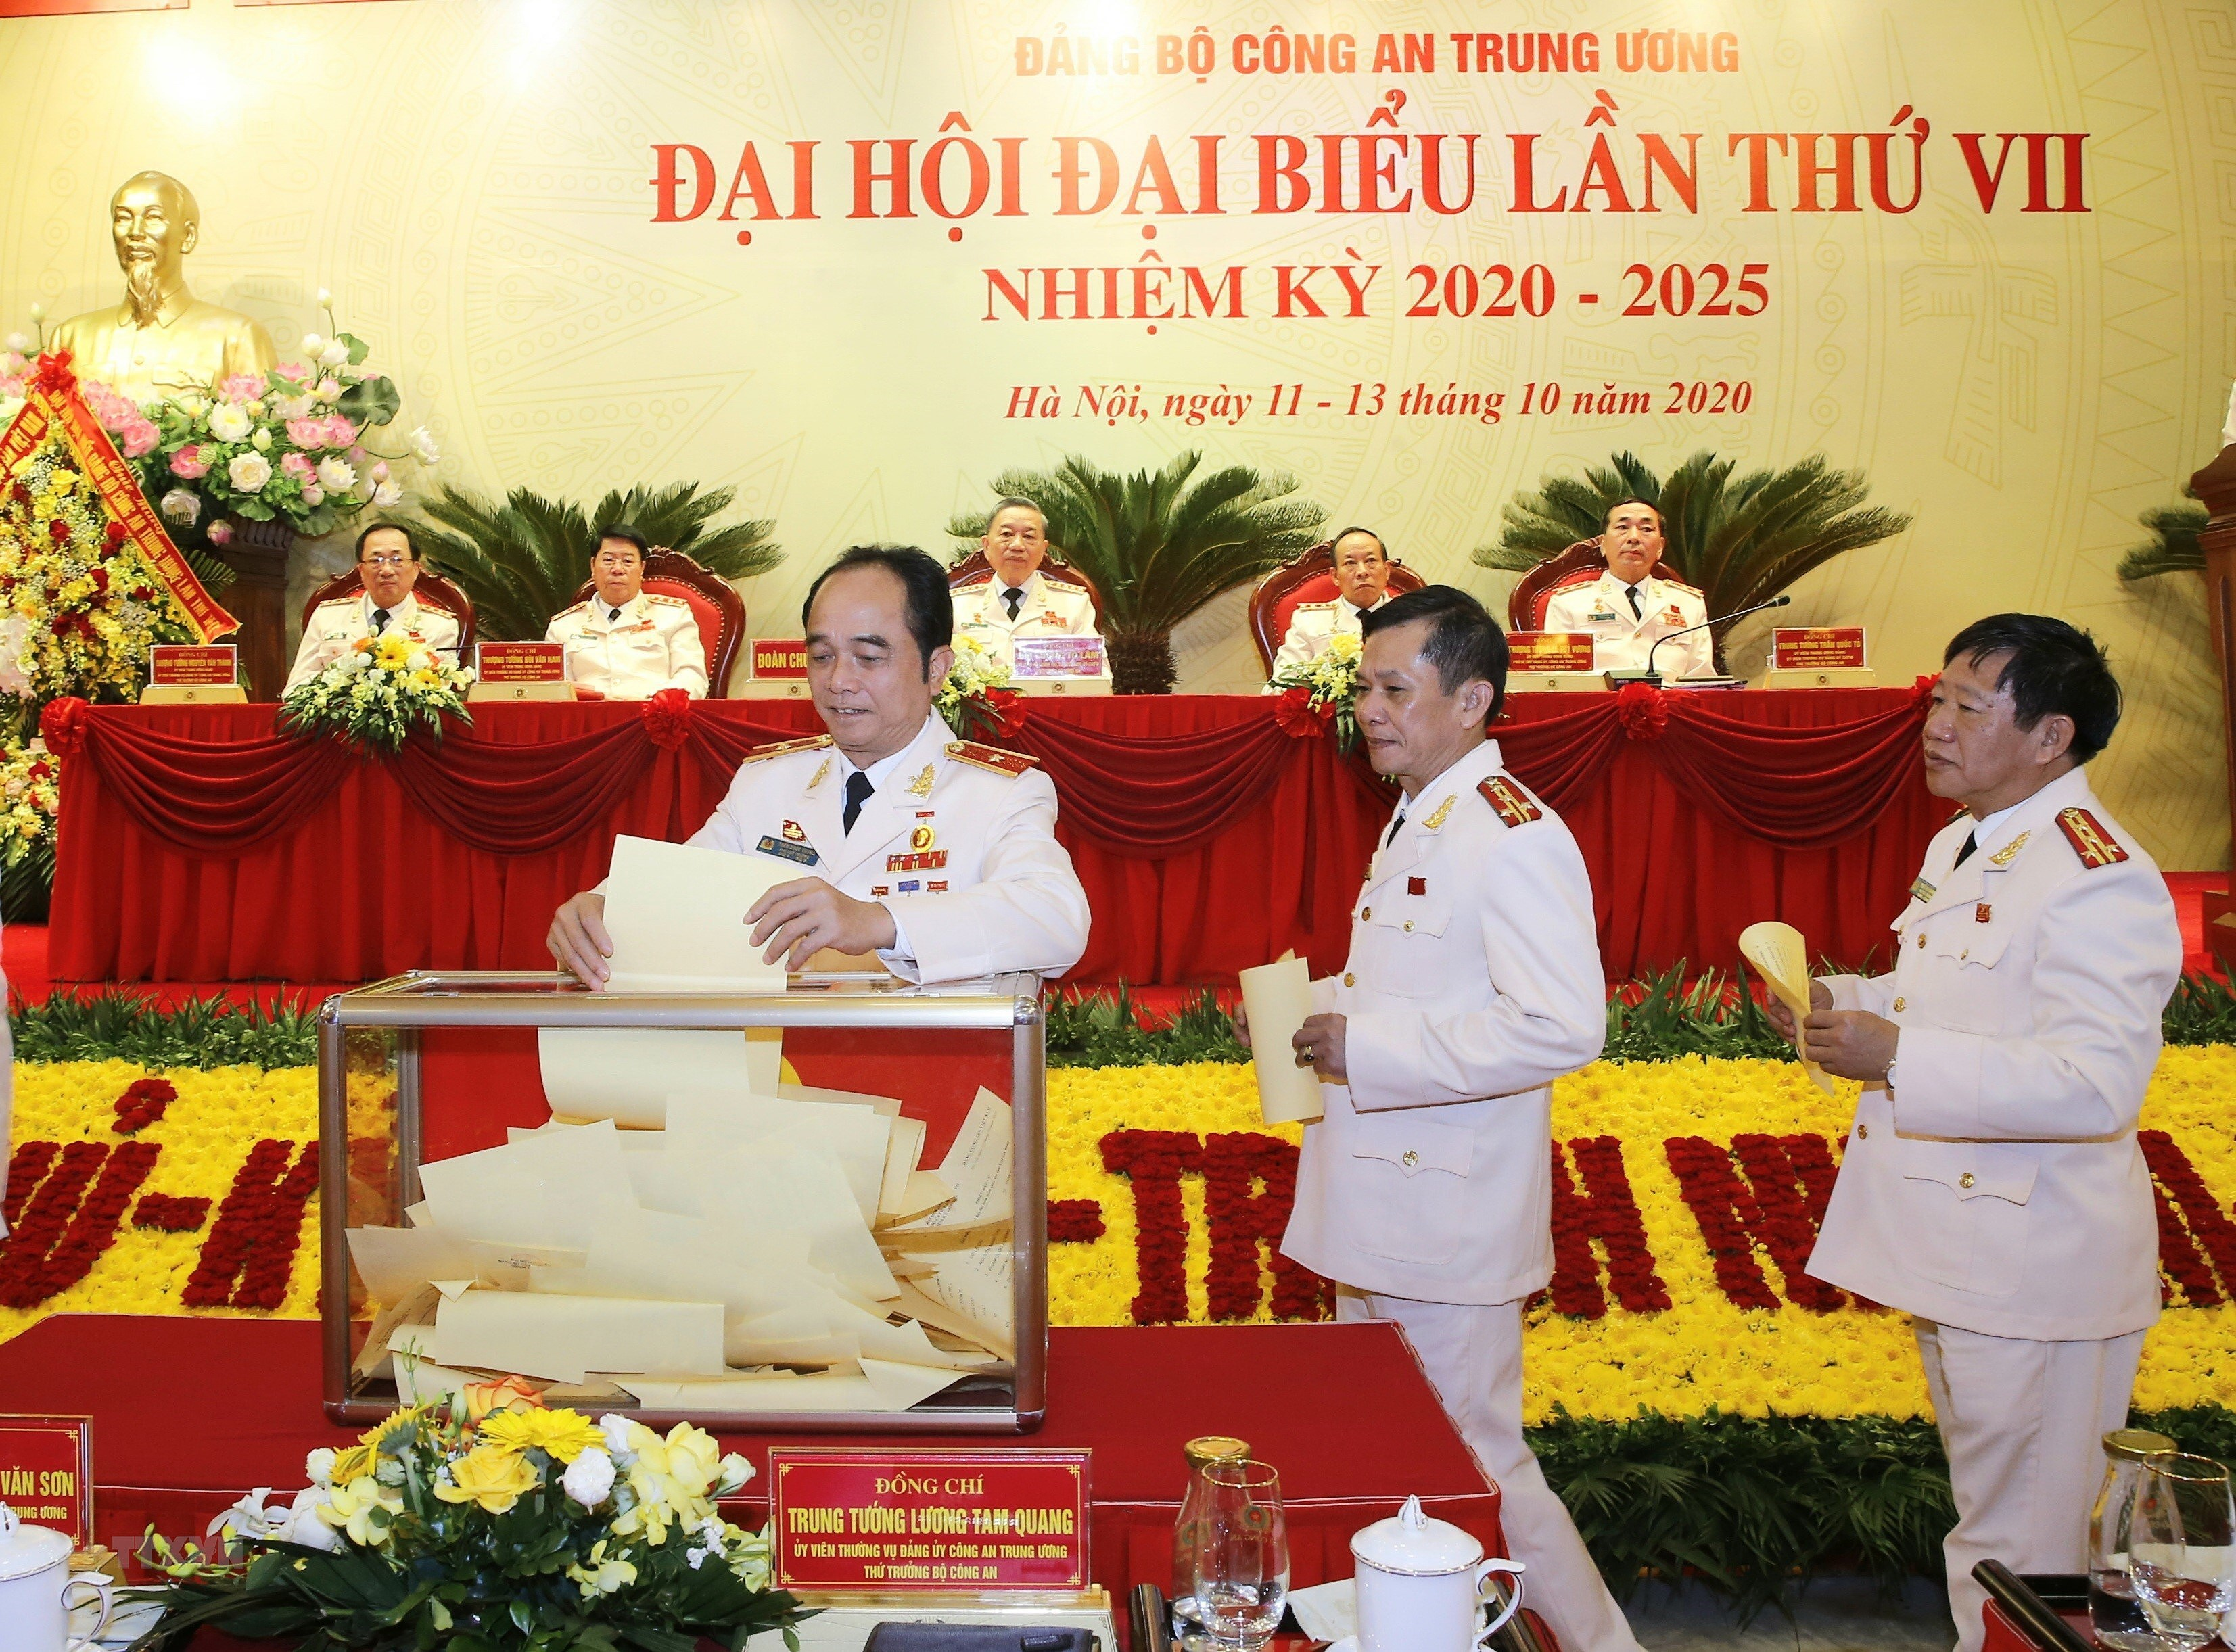 [Photo] Dai hoi dai bieu Dang bo Cong an Trung uong lan thu VII hinh anh 7